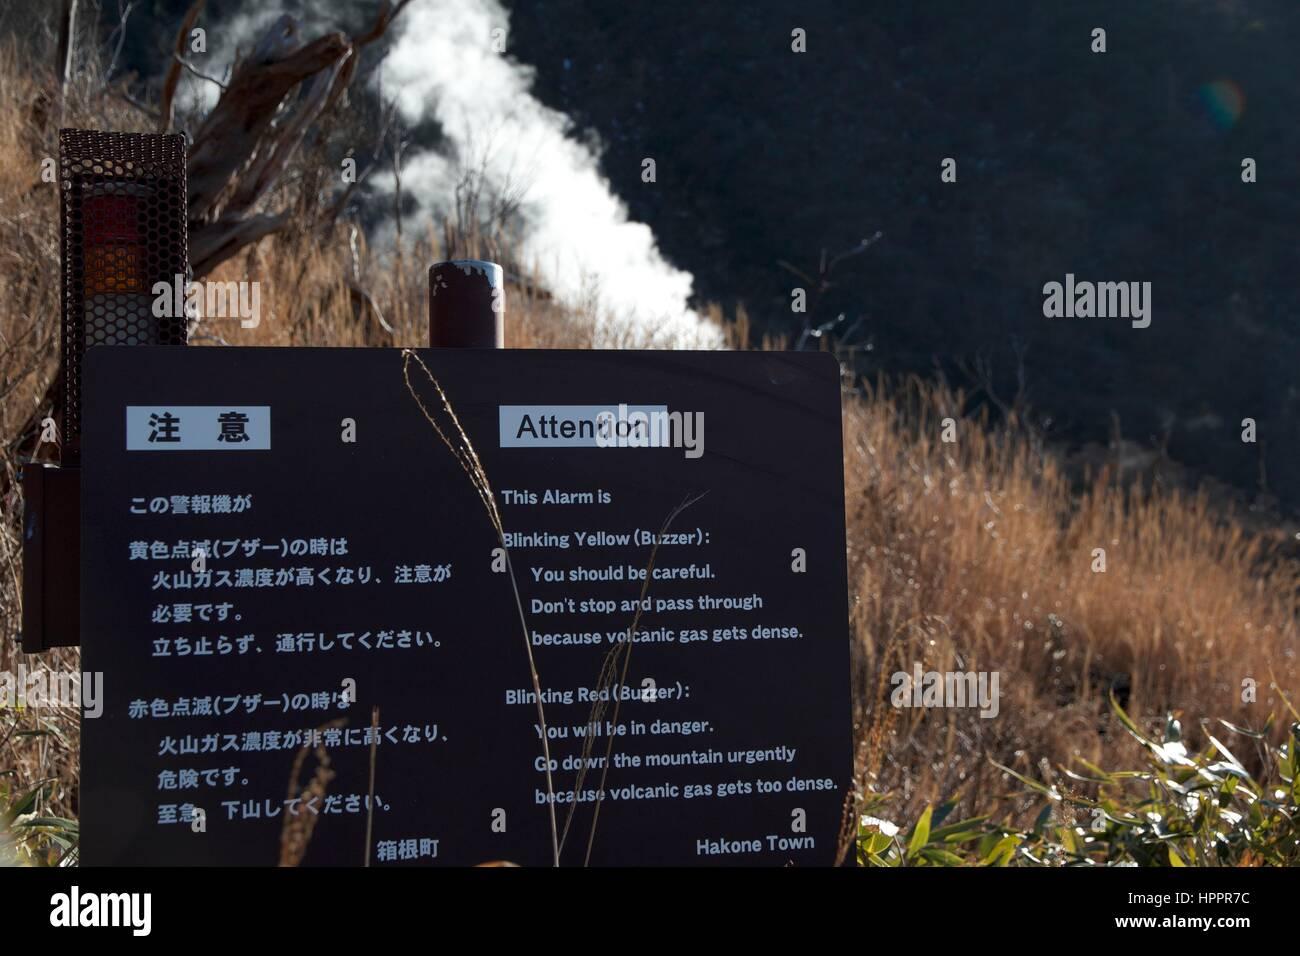 Volcanic gas warning sign and lights in Hakone, Japan, near Mount Fuji - Stock Image